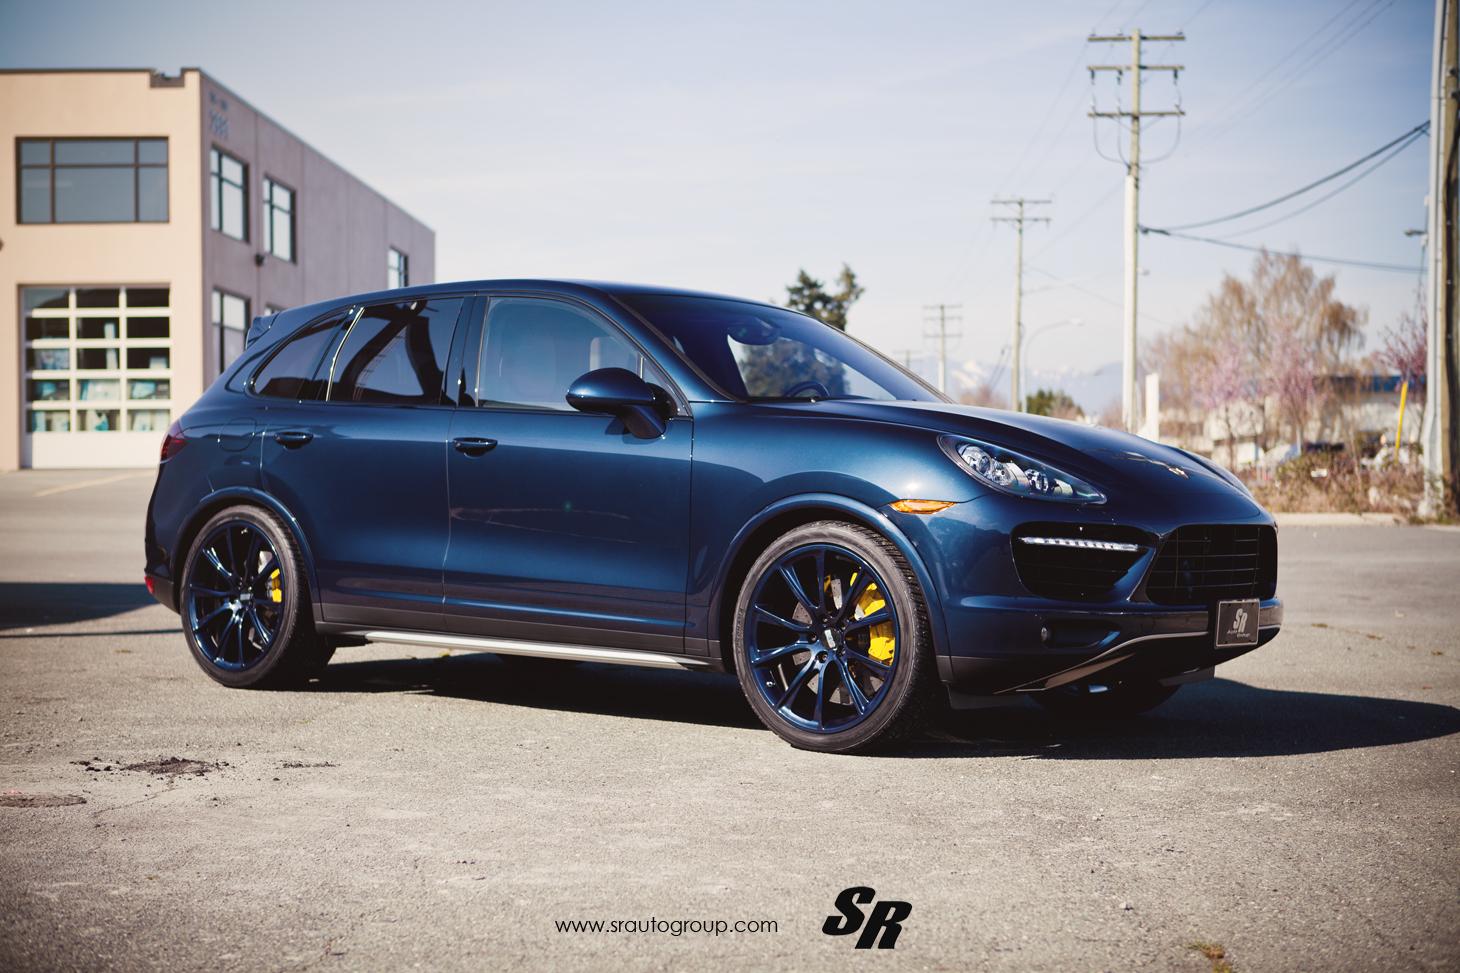 Porsche Cayenne Gets Bespoke Blue BBS Rims - autoevolution